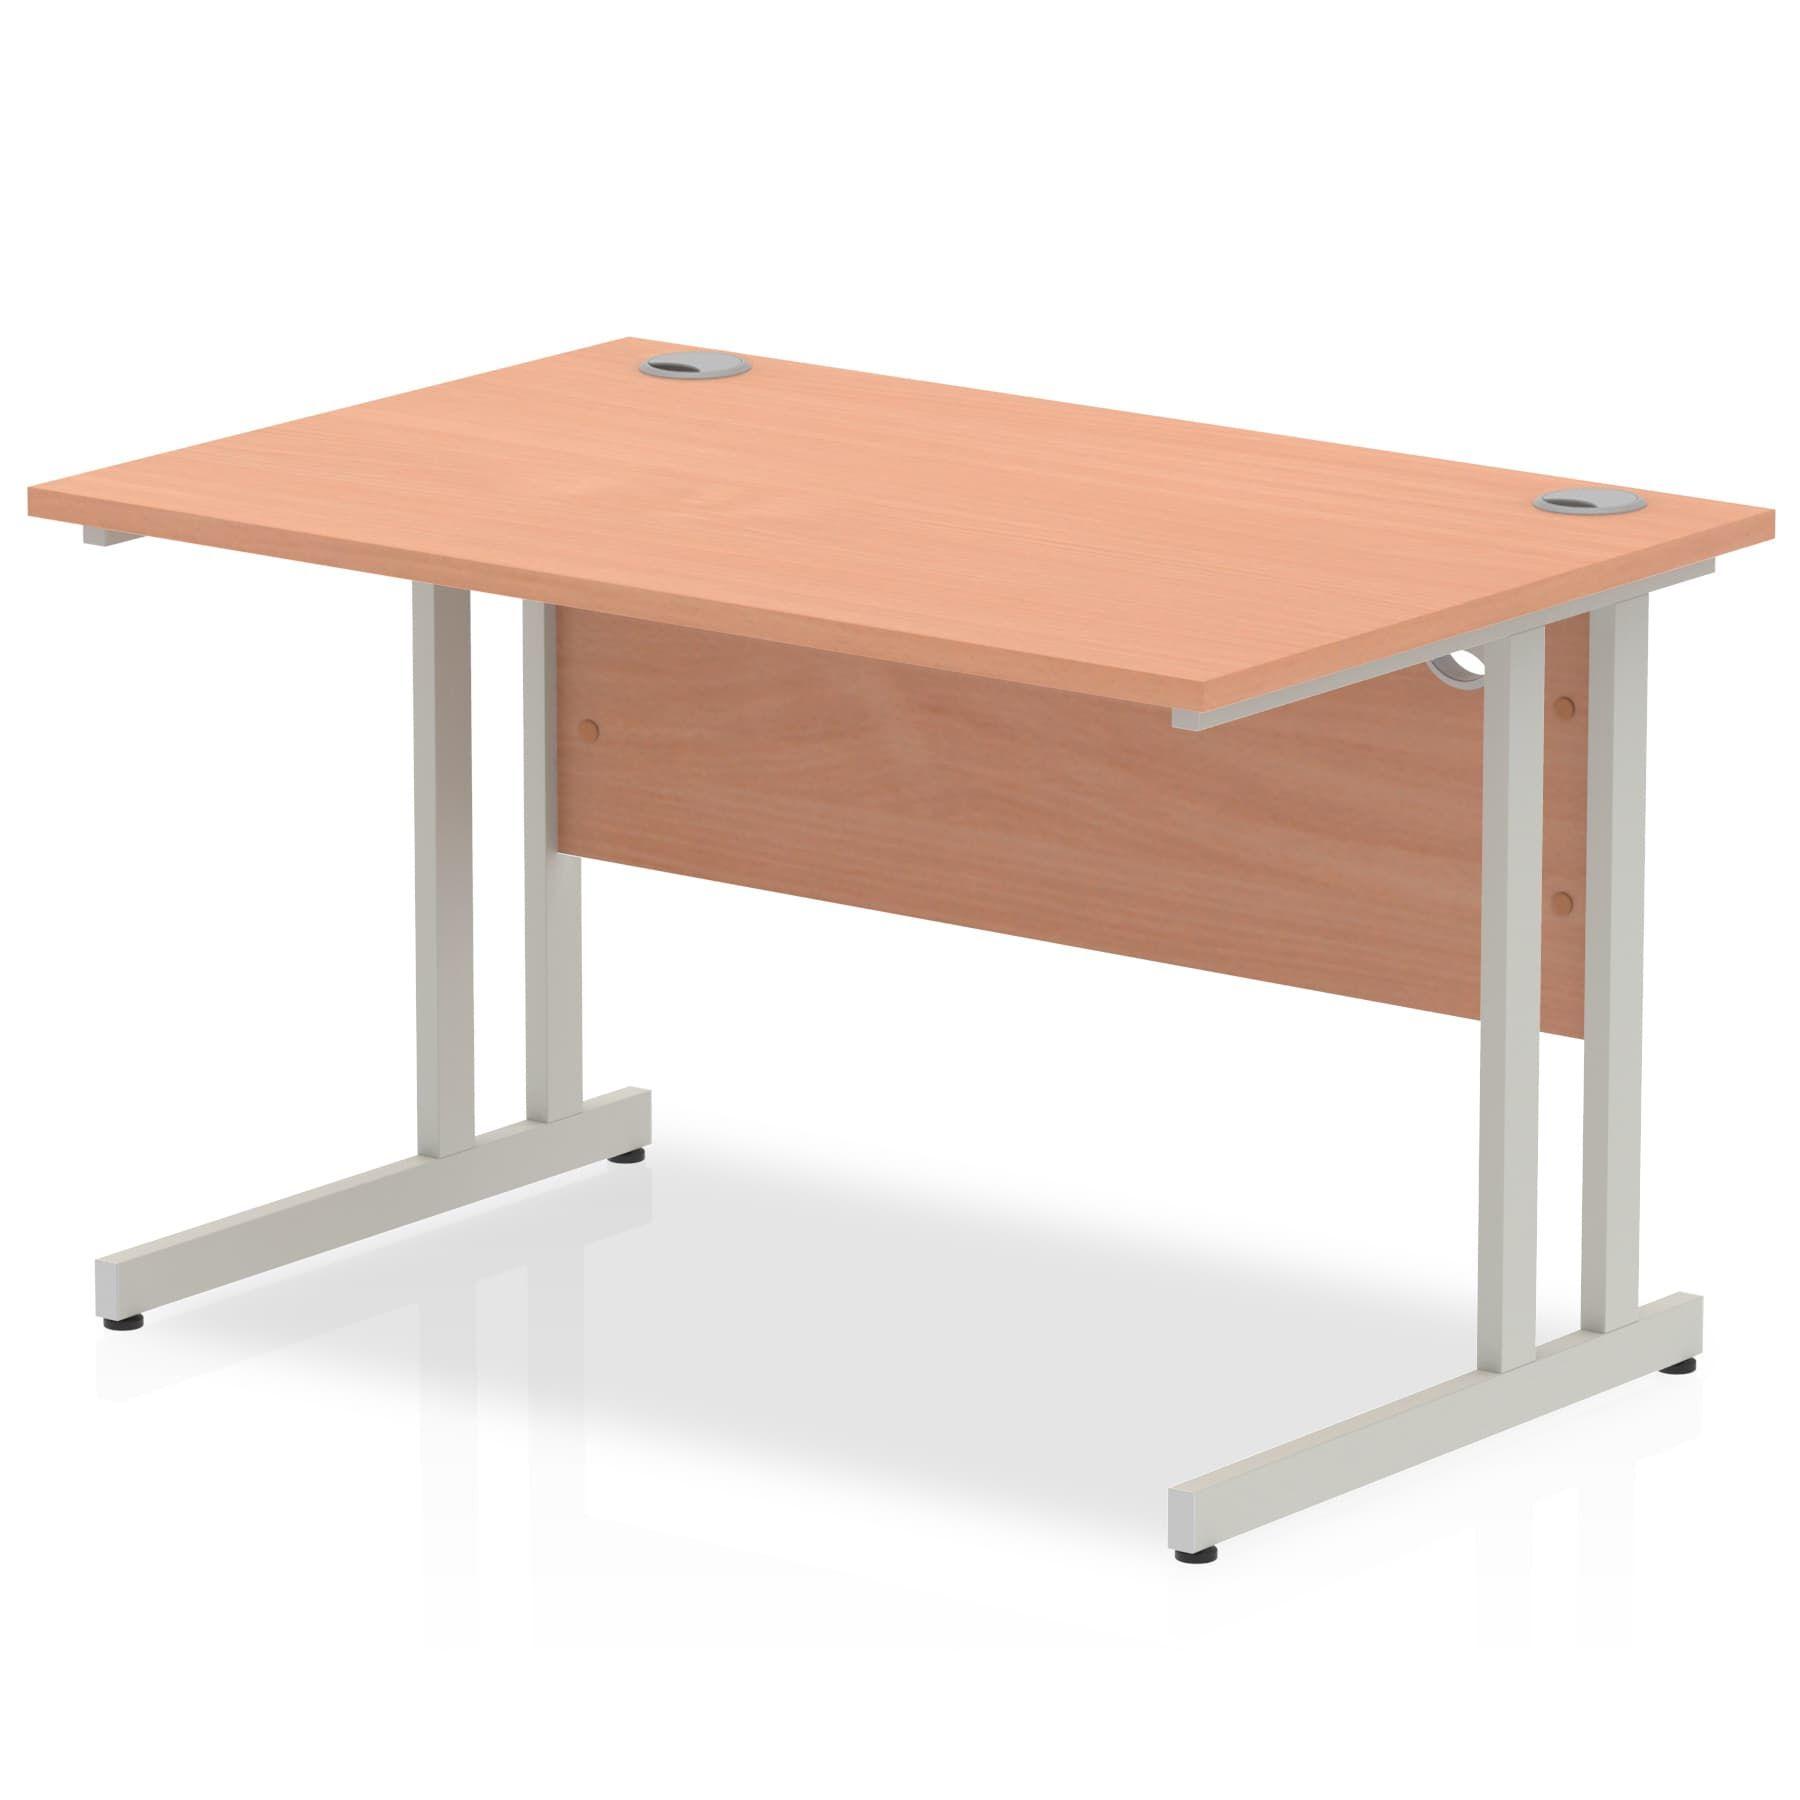 Cantilever Straight Office Computer Desk Beech NEW 1400mm x 800mm x 730mm